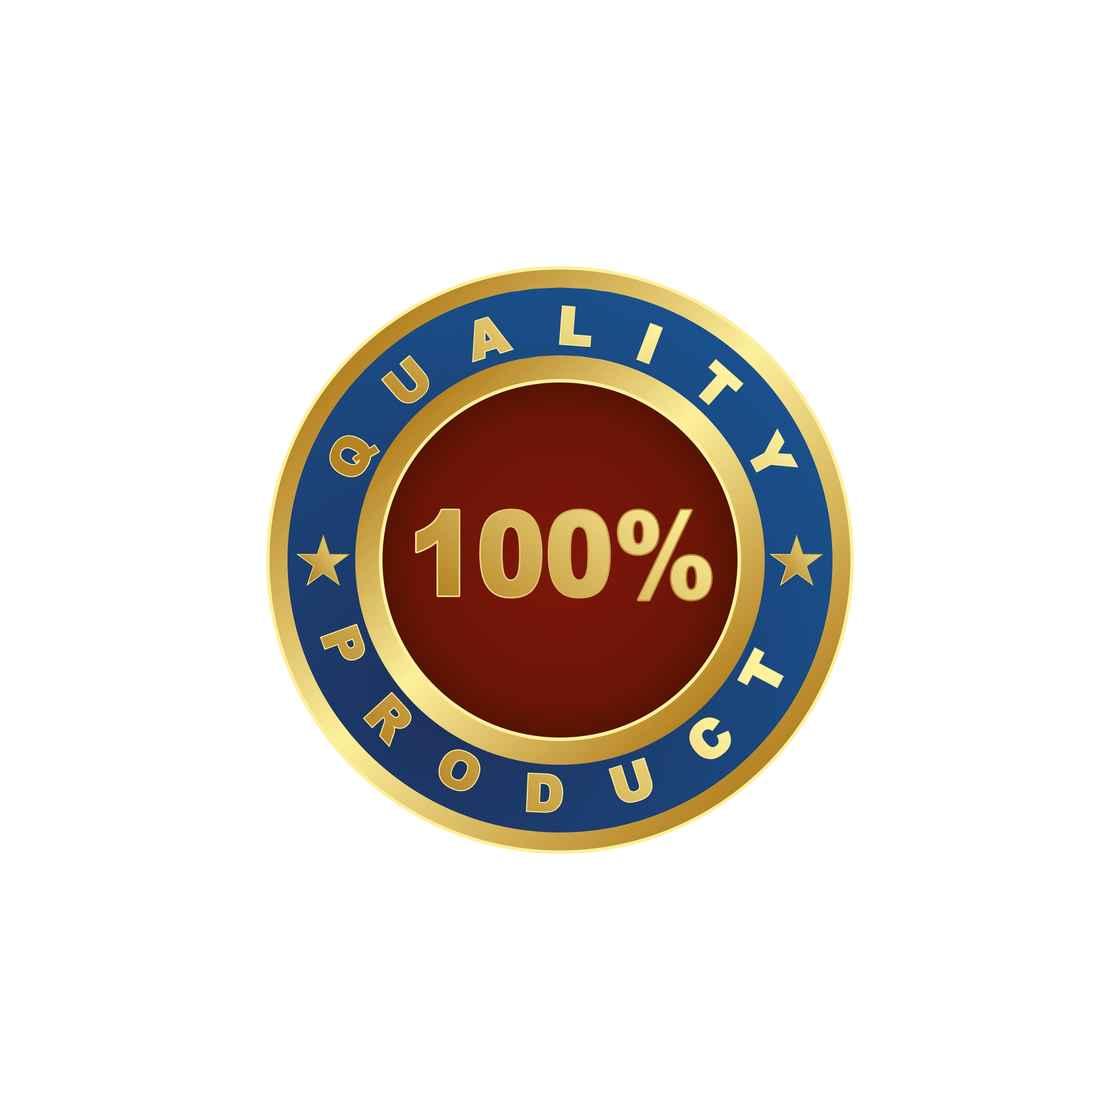 bigstock-Gold-Badges-Seal-Quality-Label-353669660.jpg